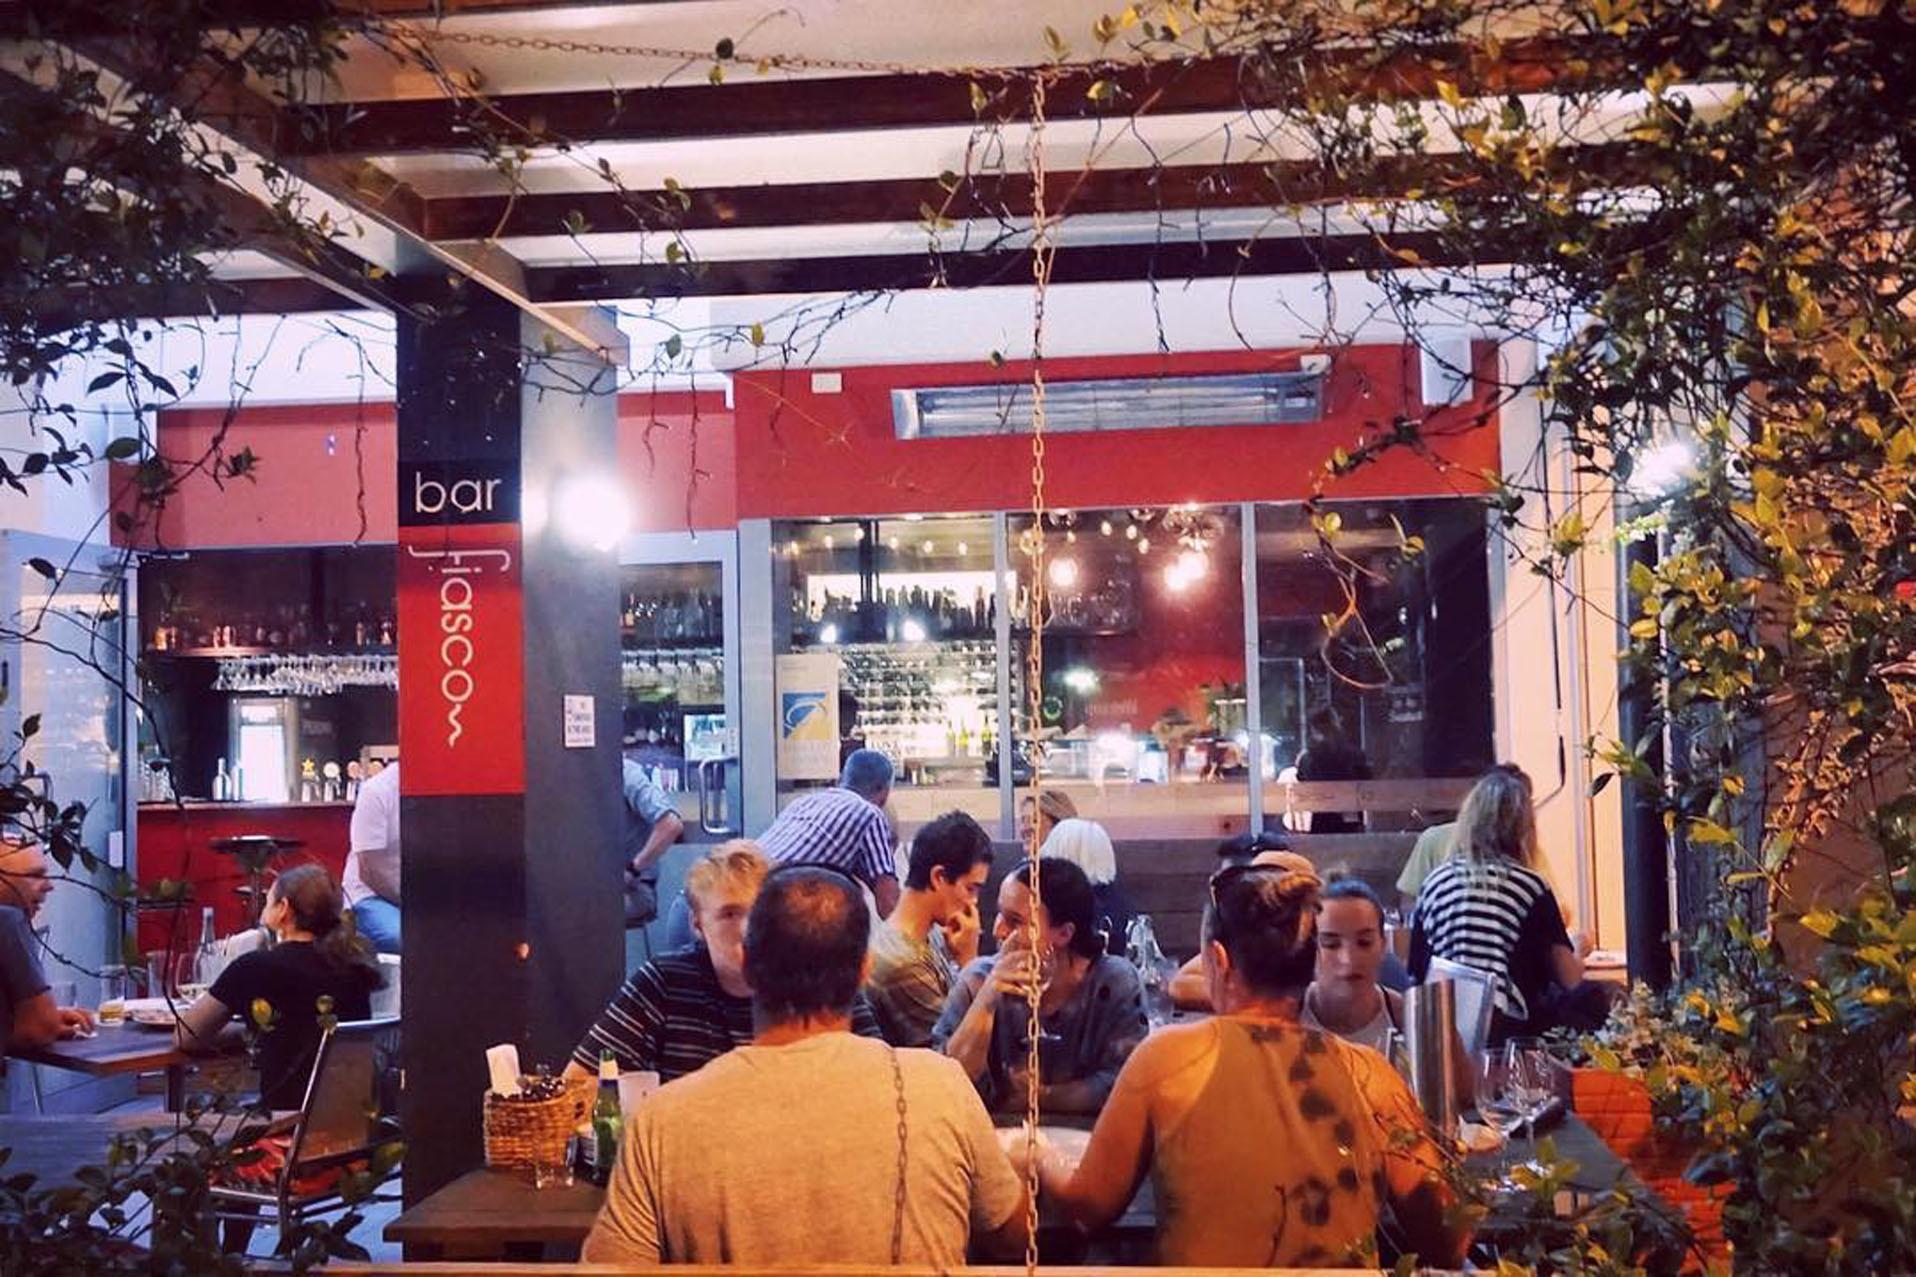 d - Fiasco Restaurant & Bar